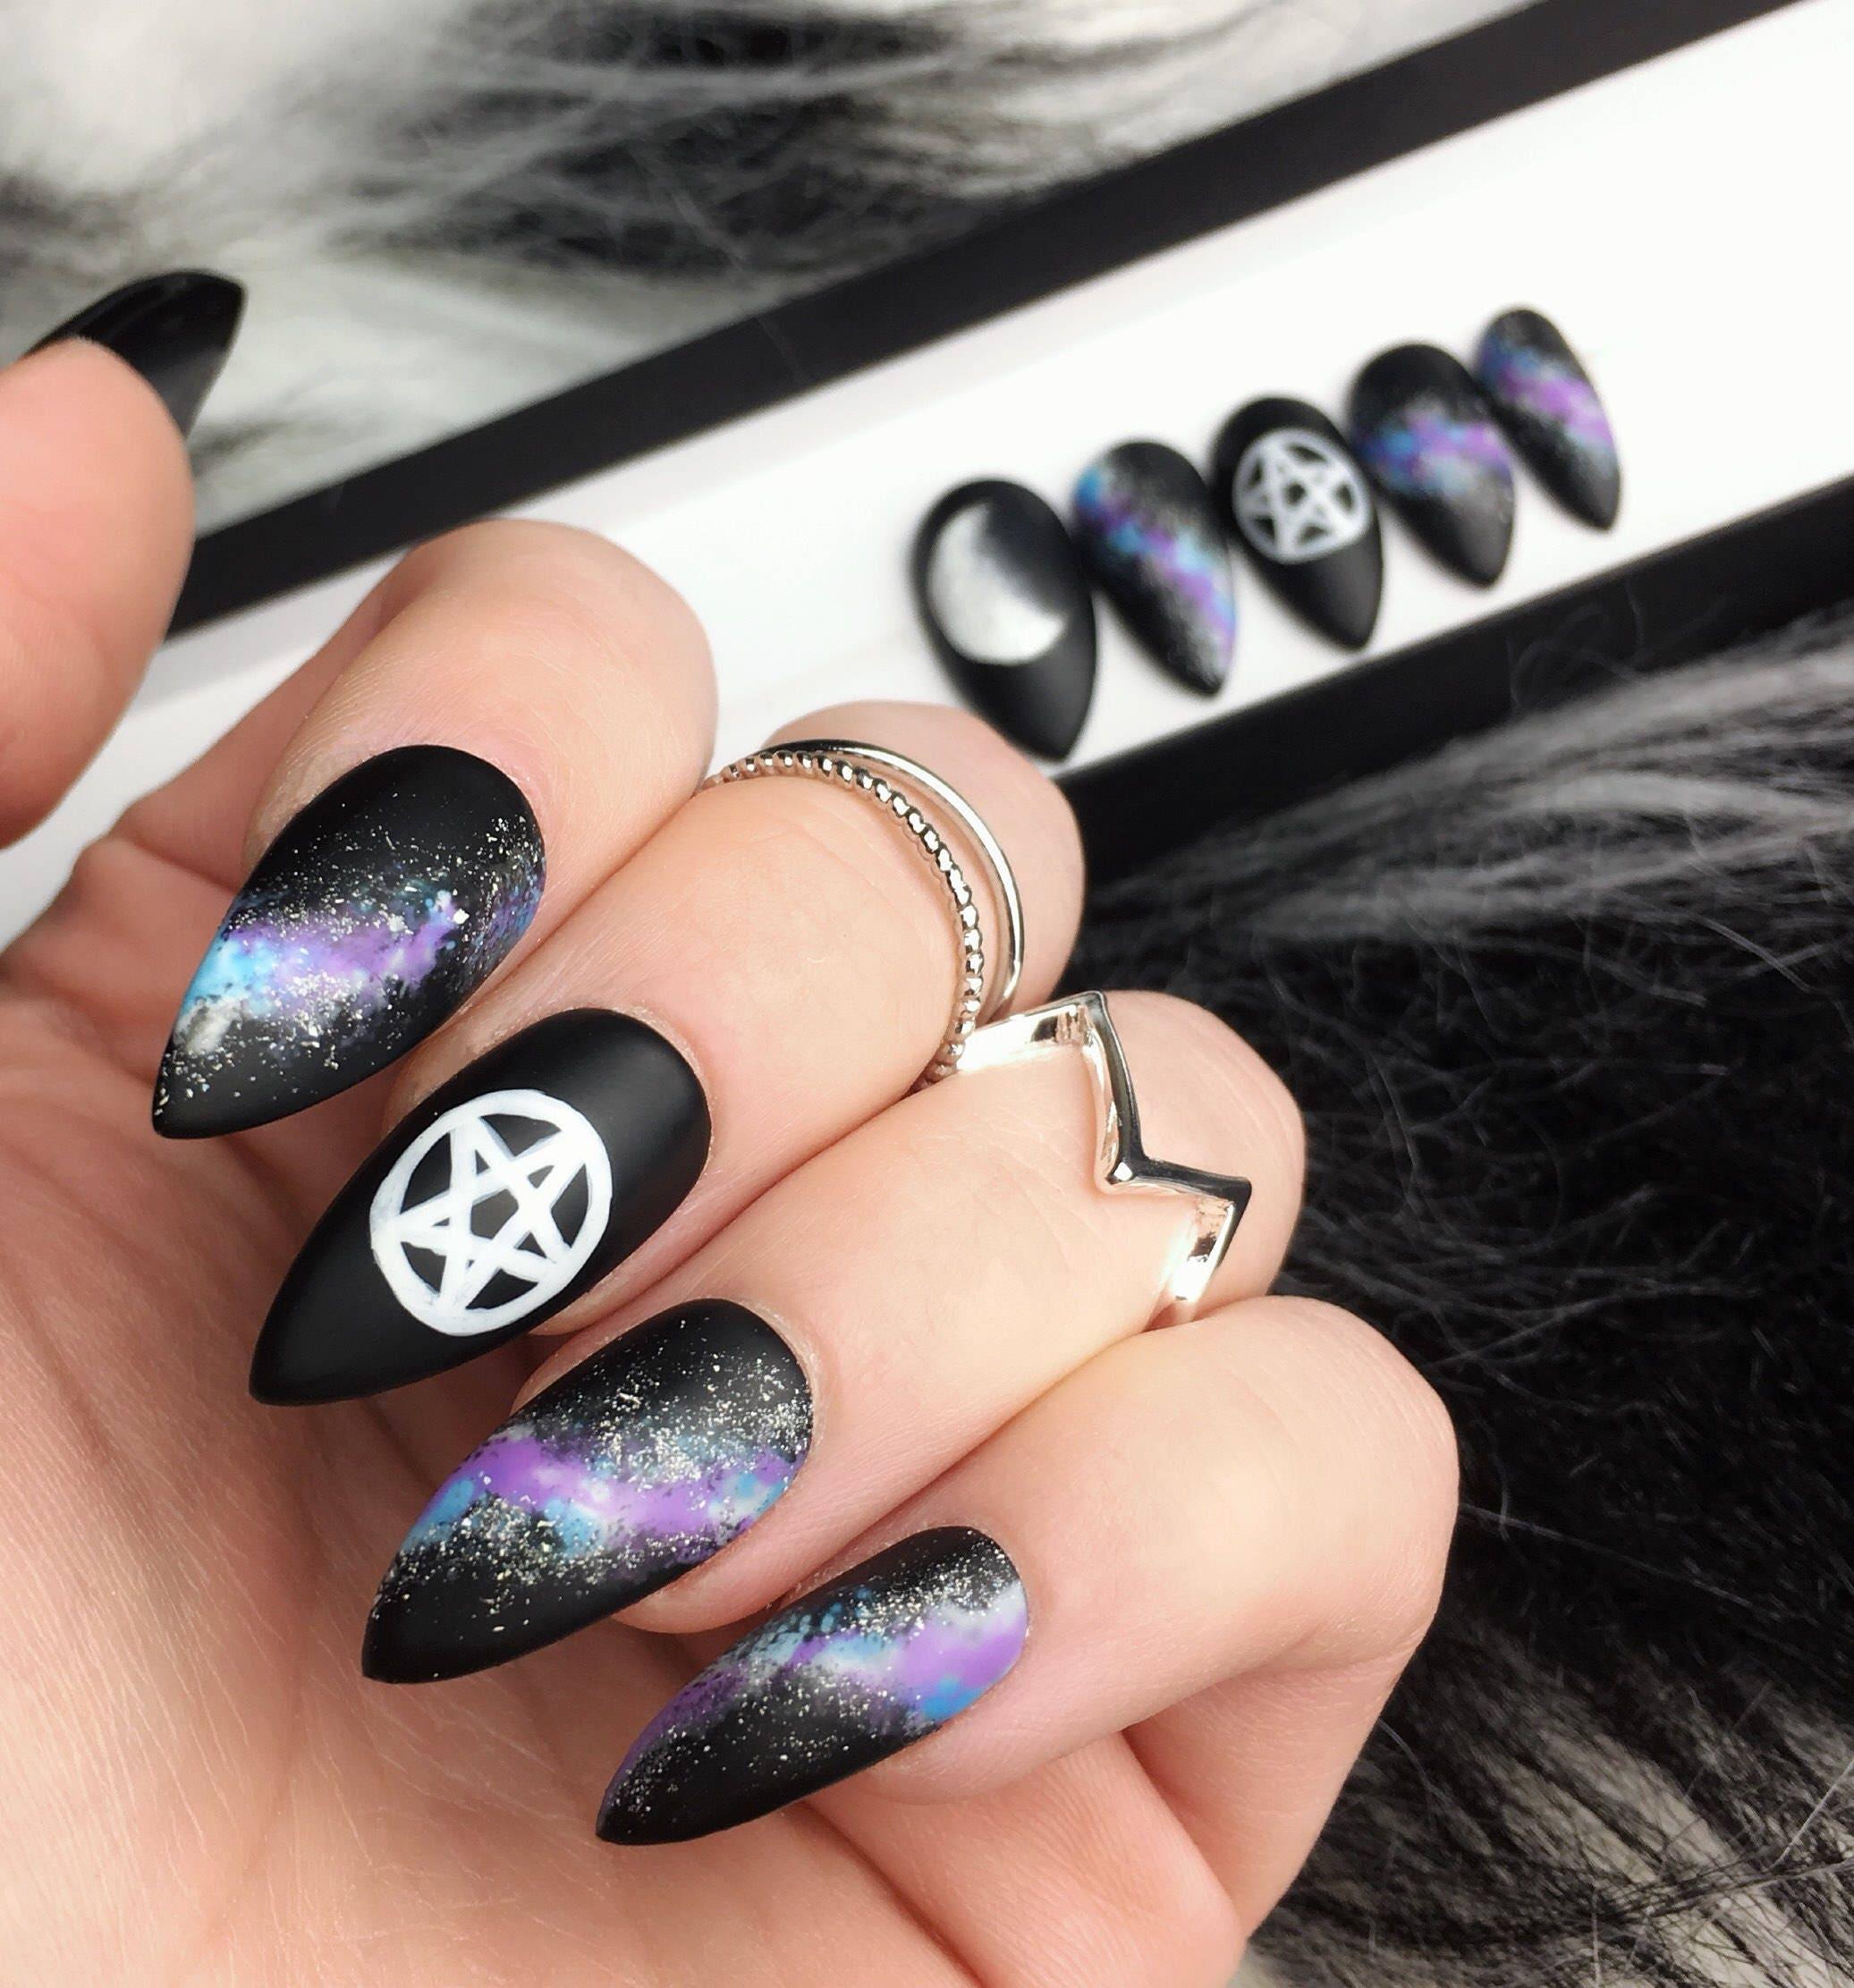 Matte Pentgram Press on Nails Galaxy False Nails Moon